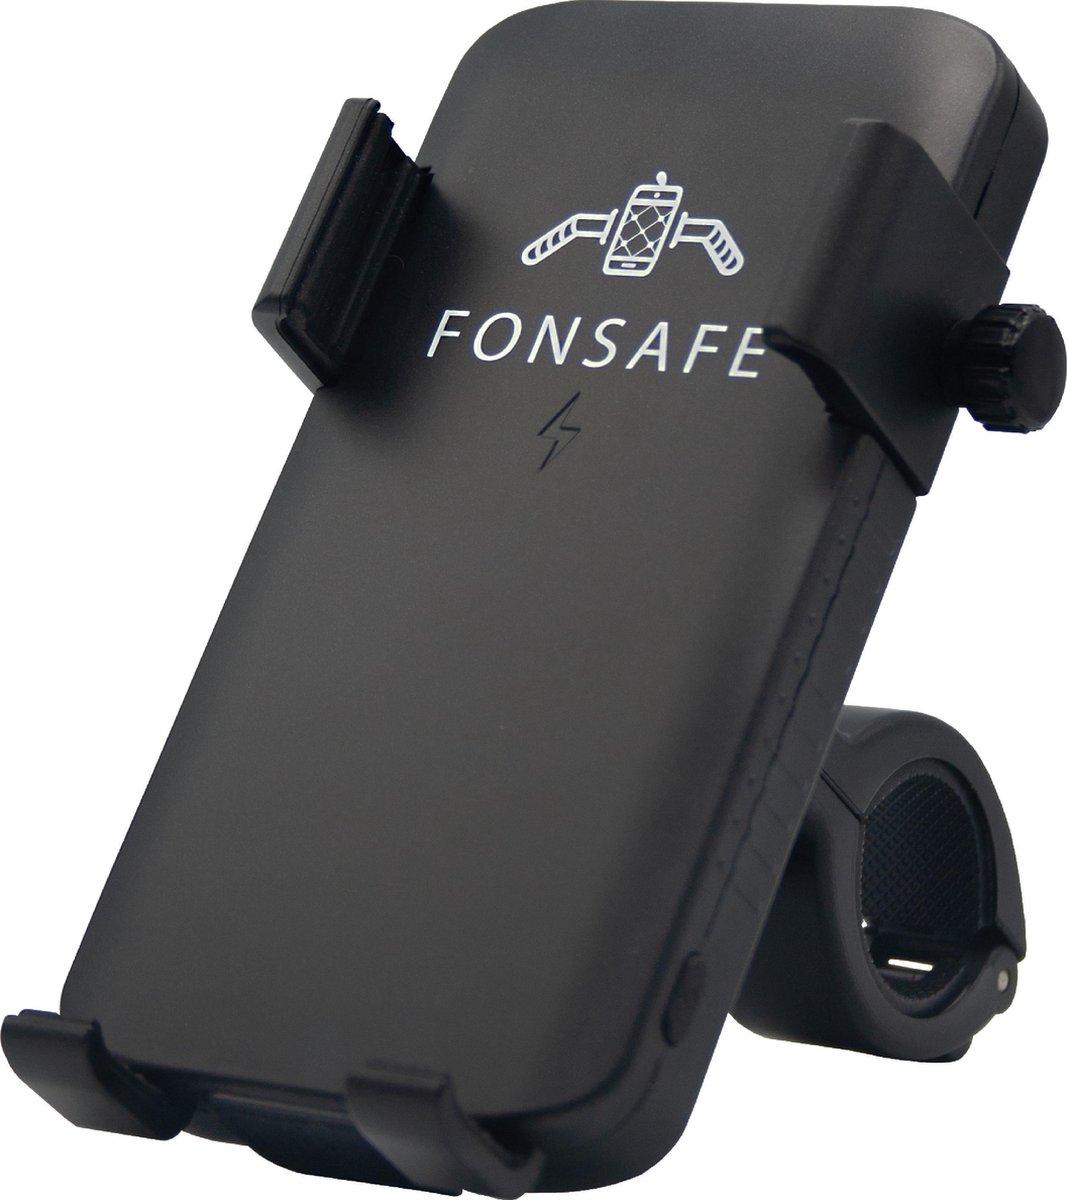 FONSAFE® 3 in 1 Telefoonhouder Fiets met Powerbank en LED Lamp - Universeel Schokbestendig - Fietsla